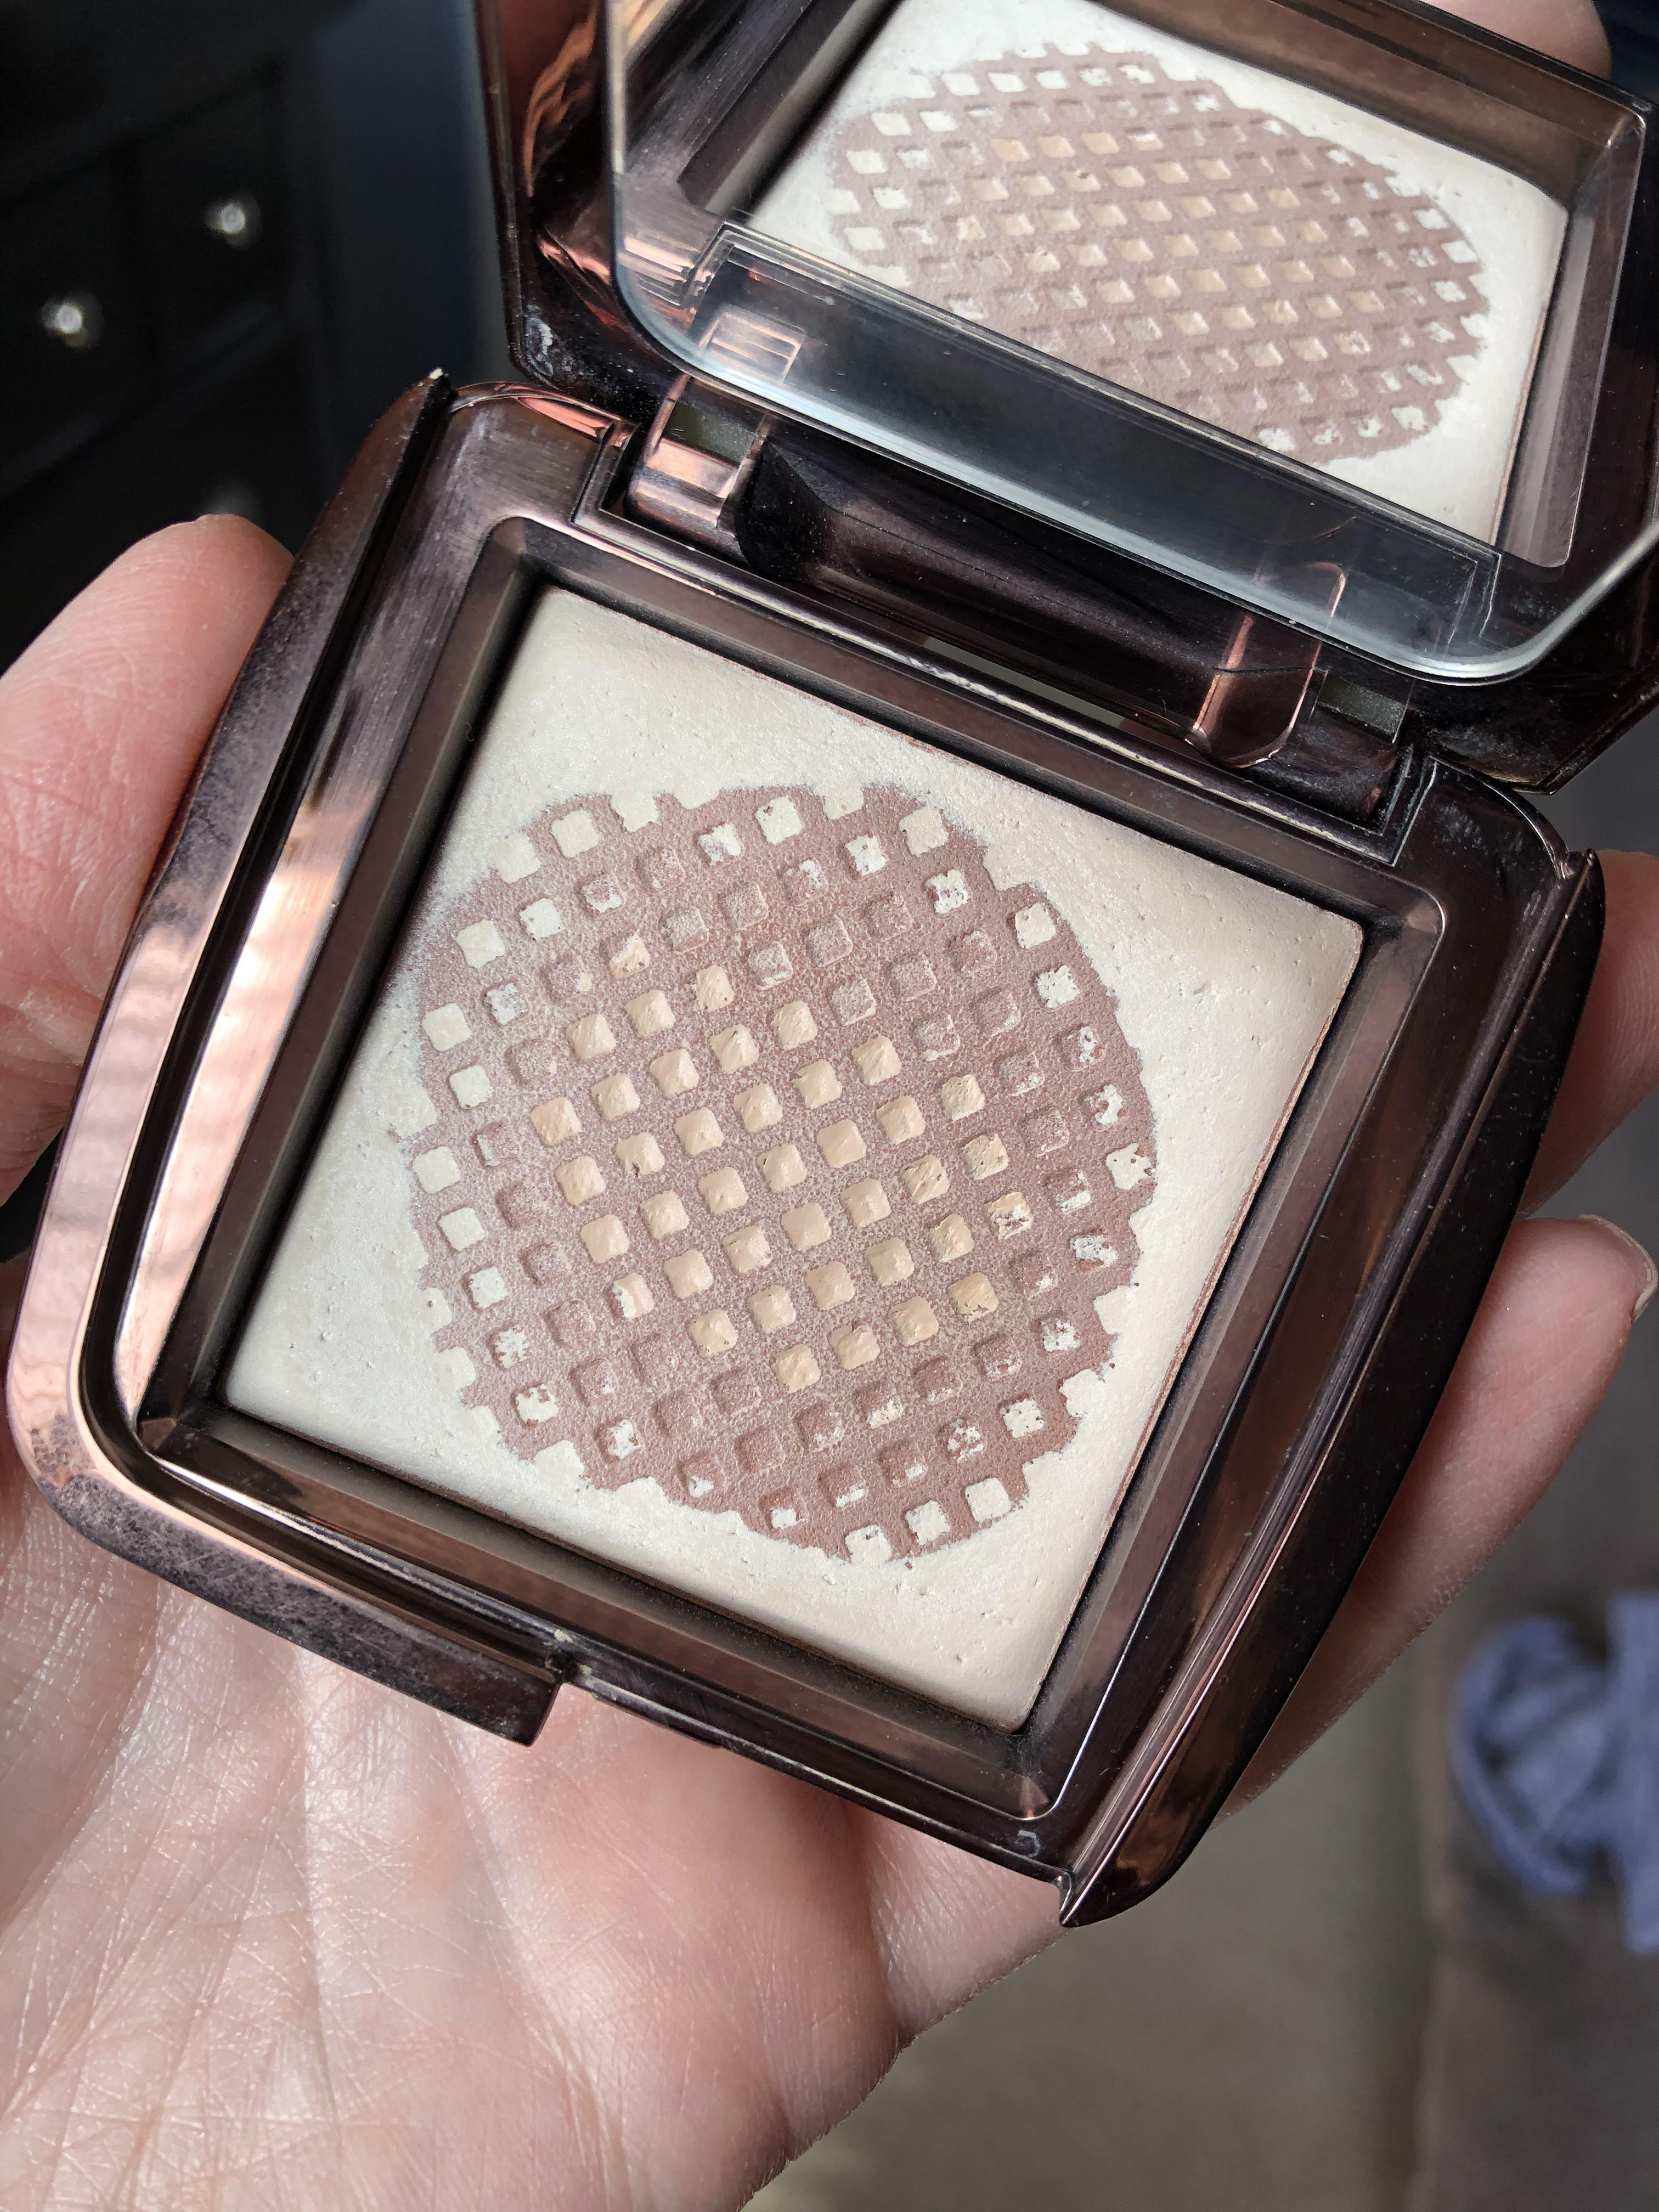 hourglass ambient lighting powder in